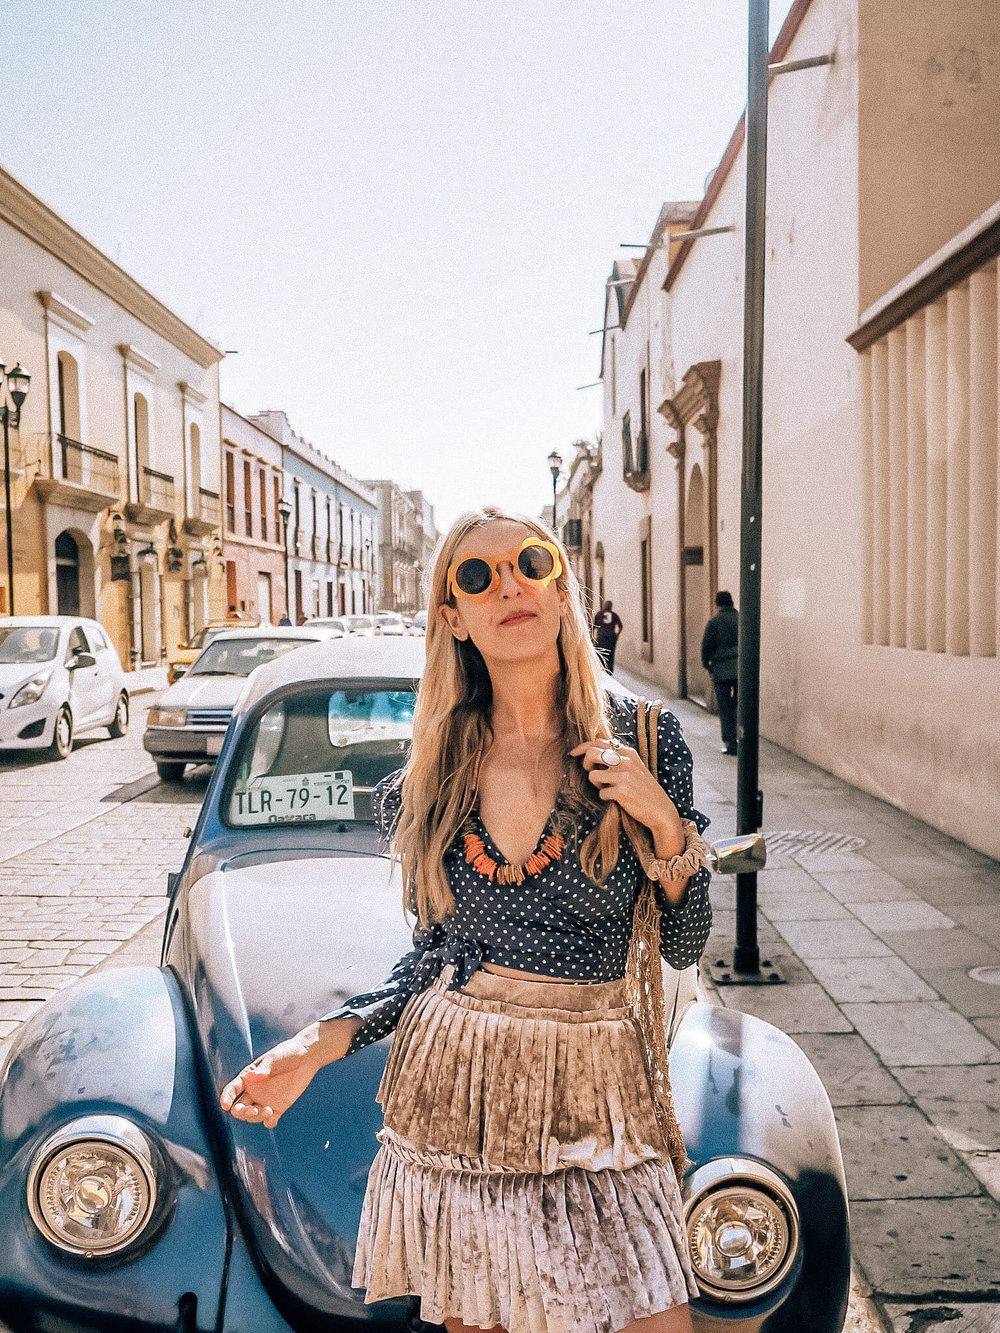 Floral sunglasses, bohemian style, Oaxaca Brunch